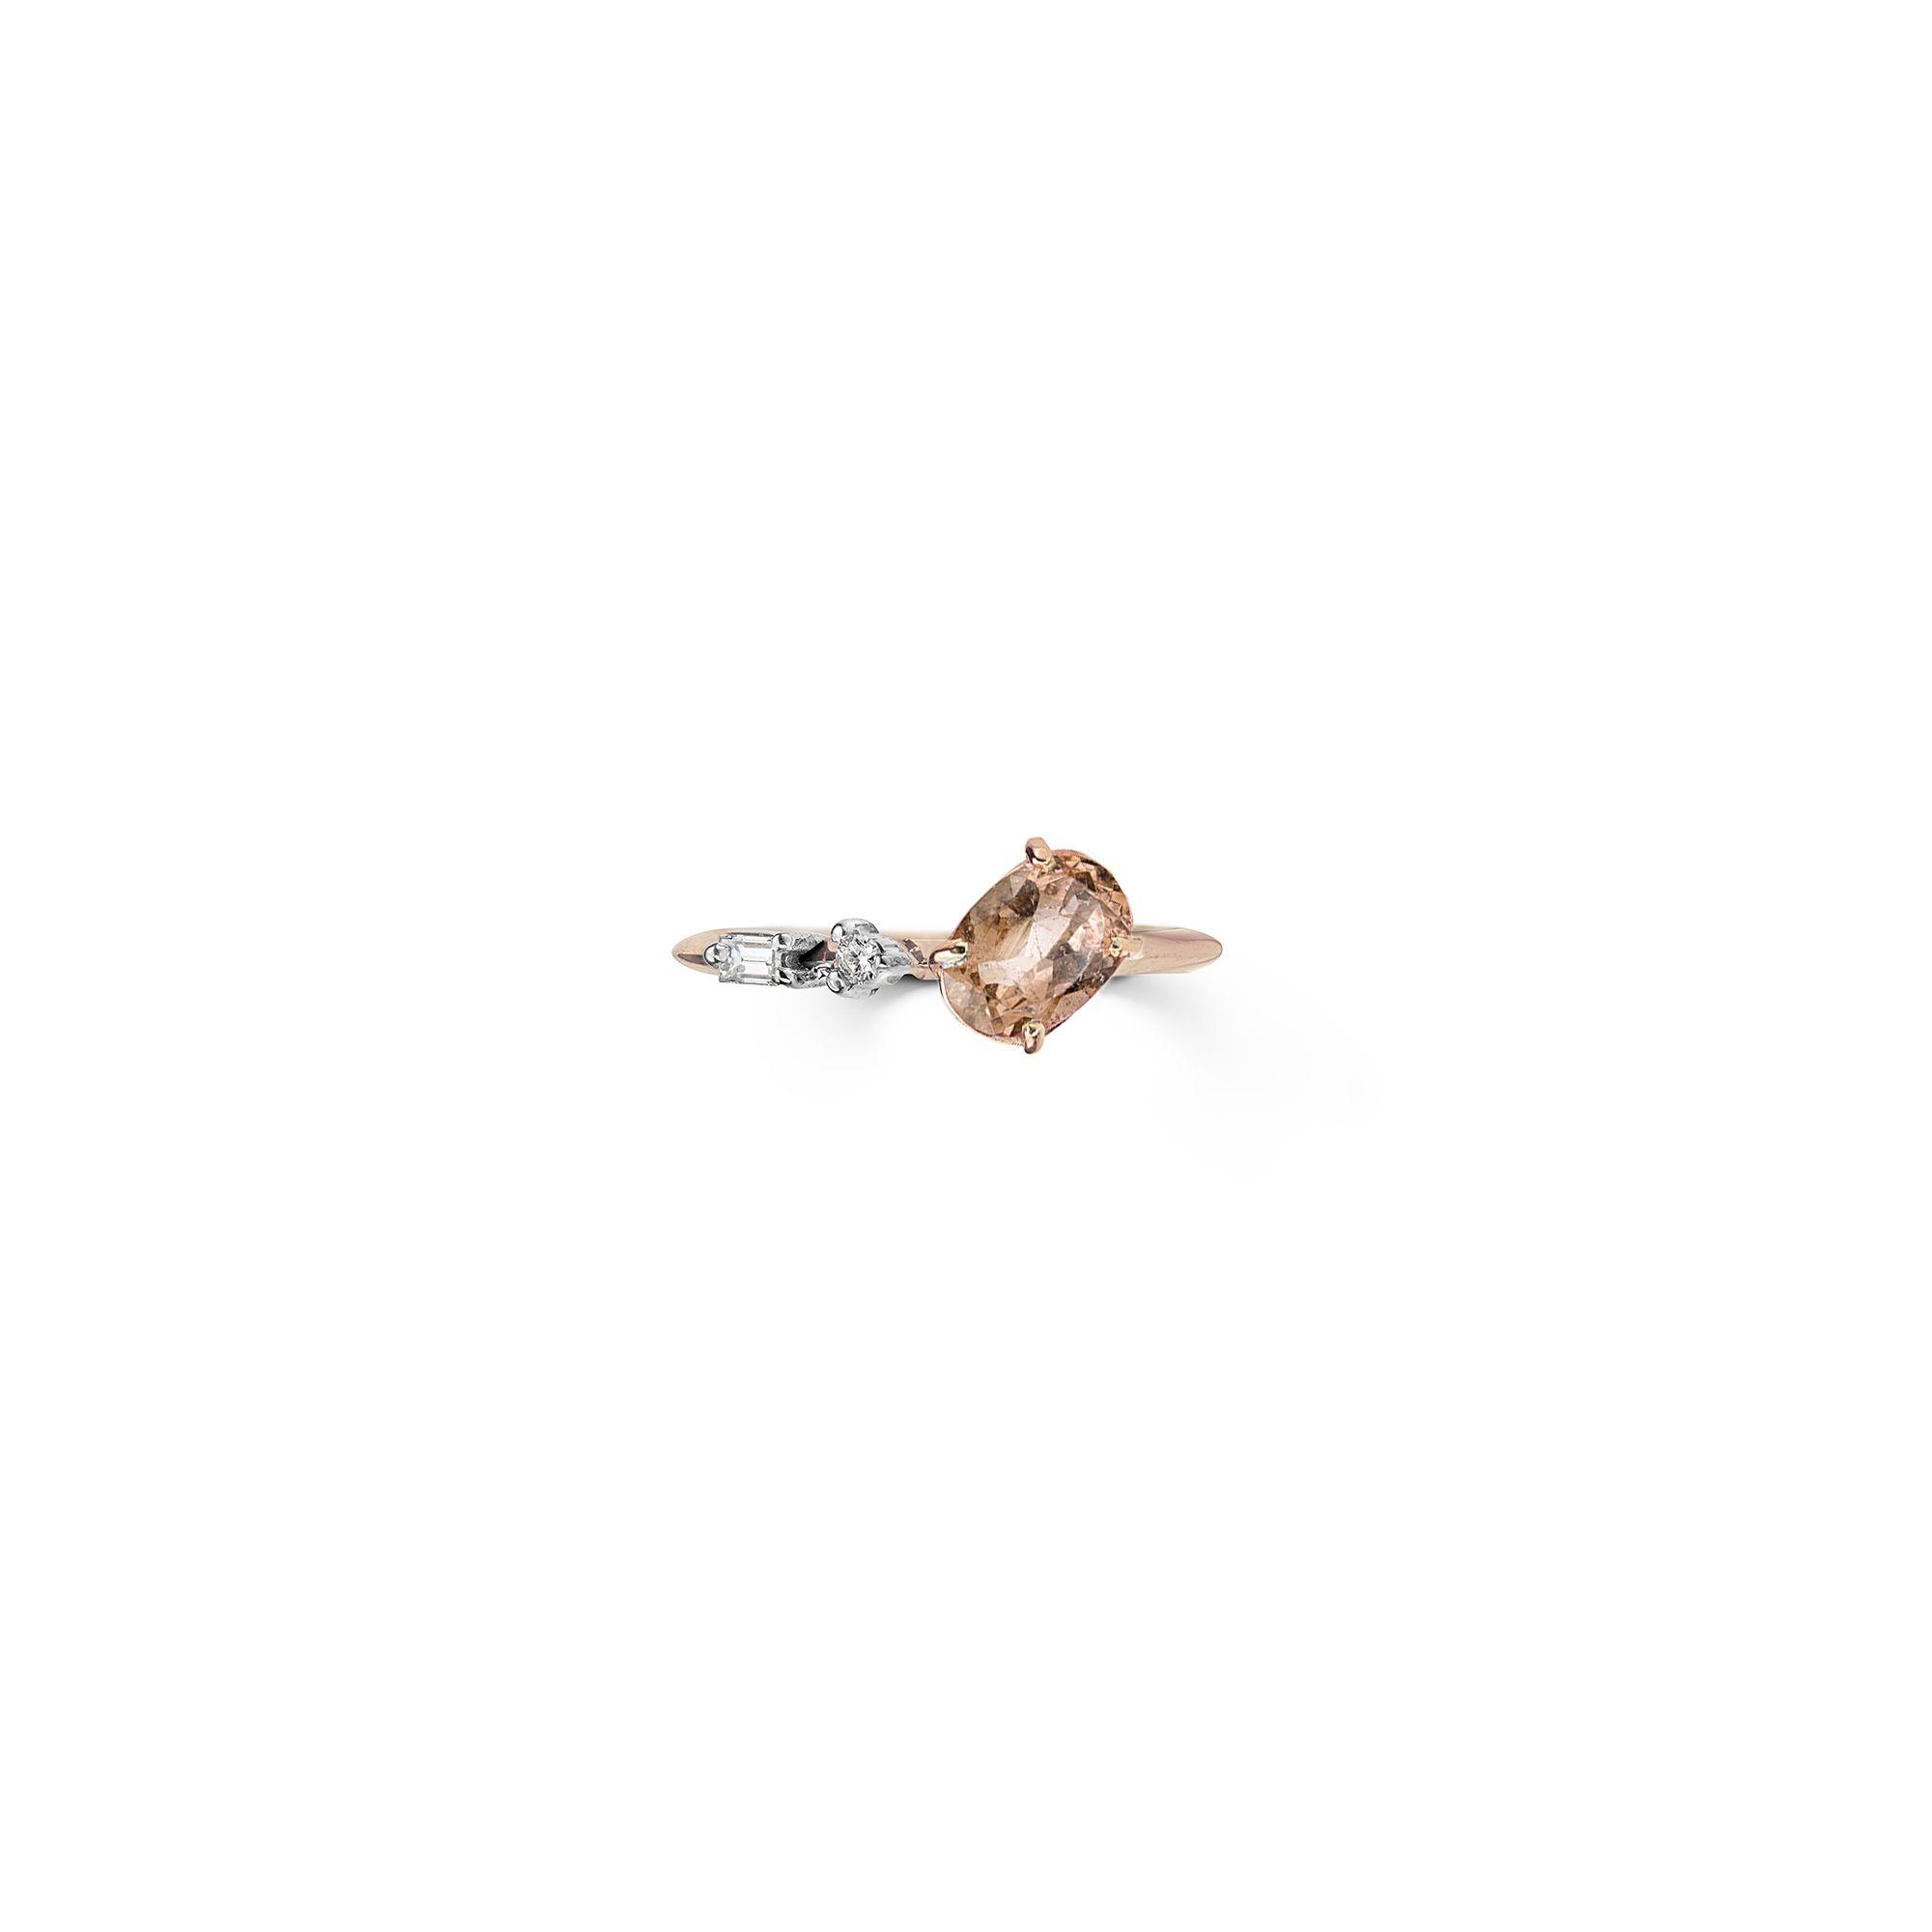 Tourmaline 'Balance' ring Rose gold ring with tourmaline and diamonds